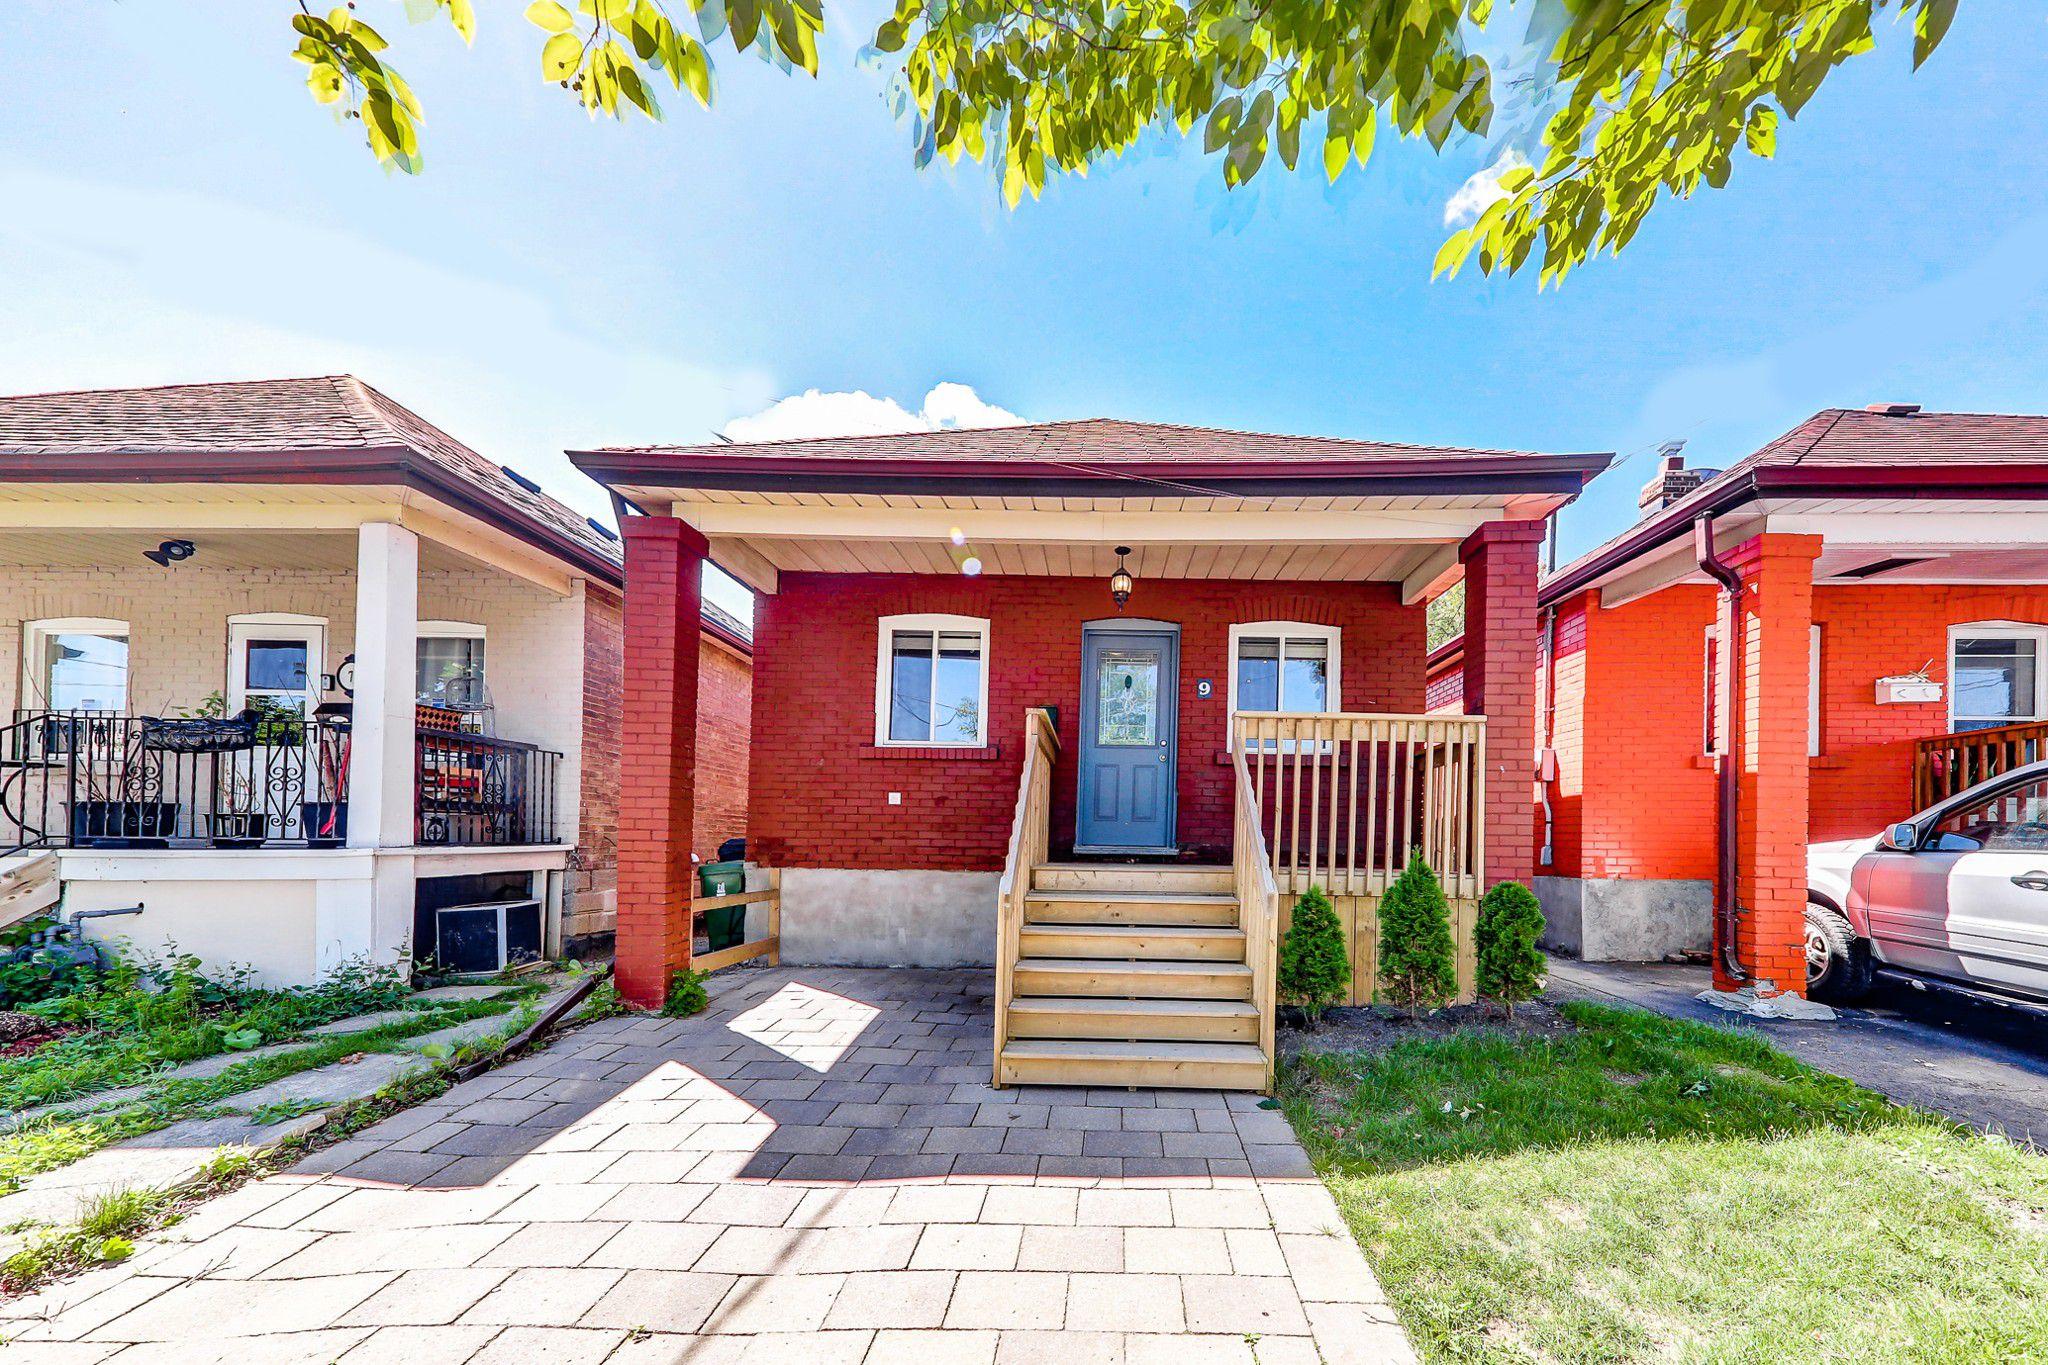 Main Photo: 9 Maple Bush Avenue in Toronto: Humberlea-Pelmo Park W4 House (Bungalow) for sale (Toronto W04)  : MLS®# W4180095